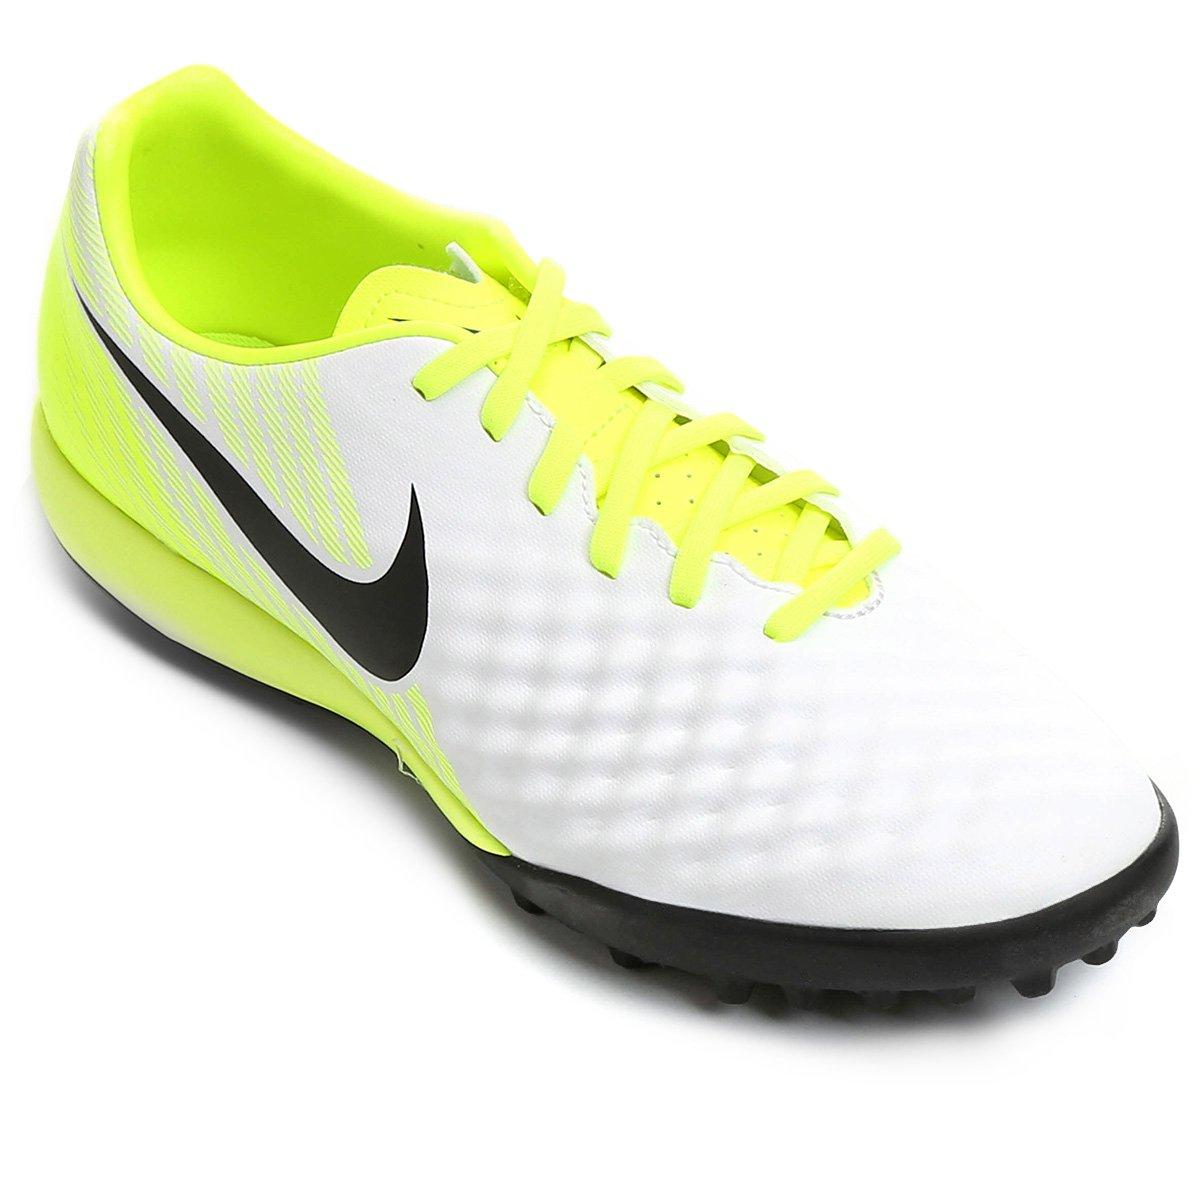 Chuteira Society Nike Magista Onda II TF - Branco e Preto - Compre ... ddaa1f93b42b5